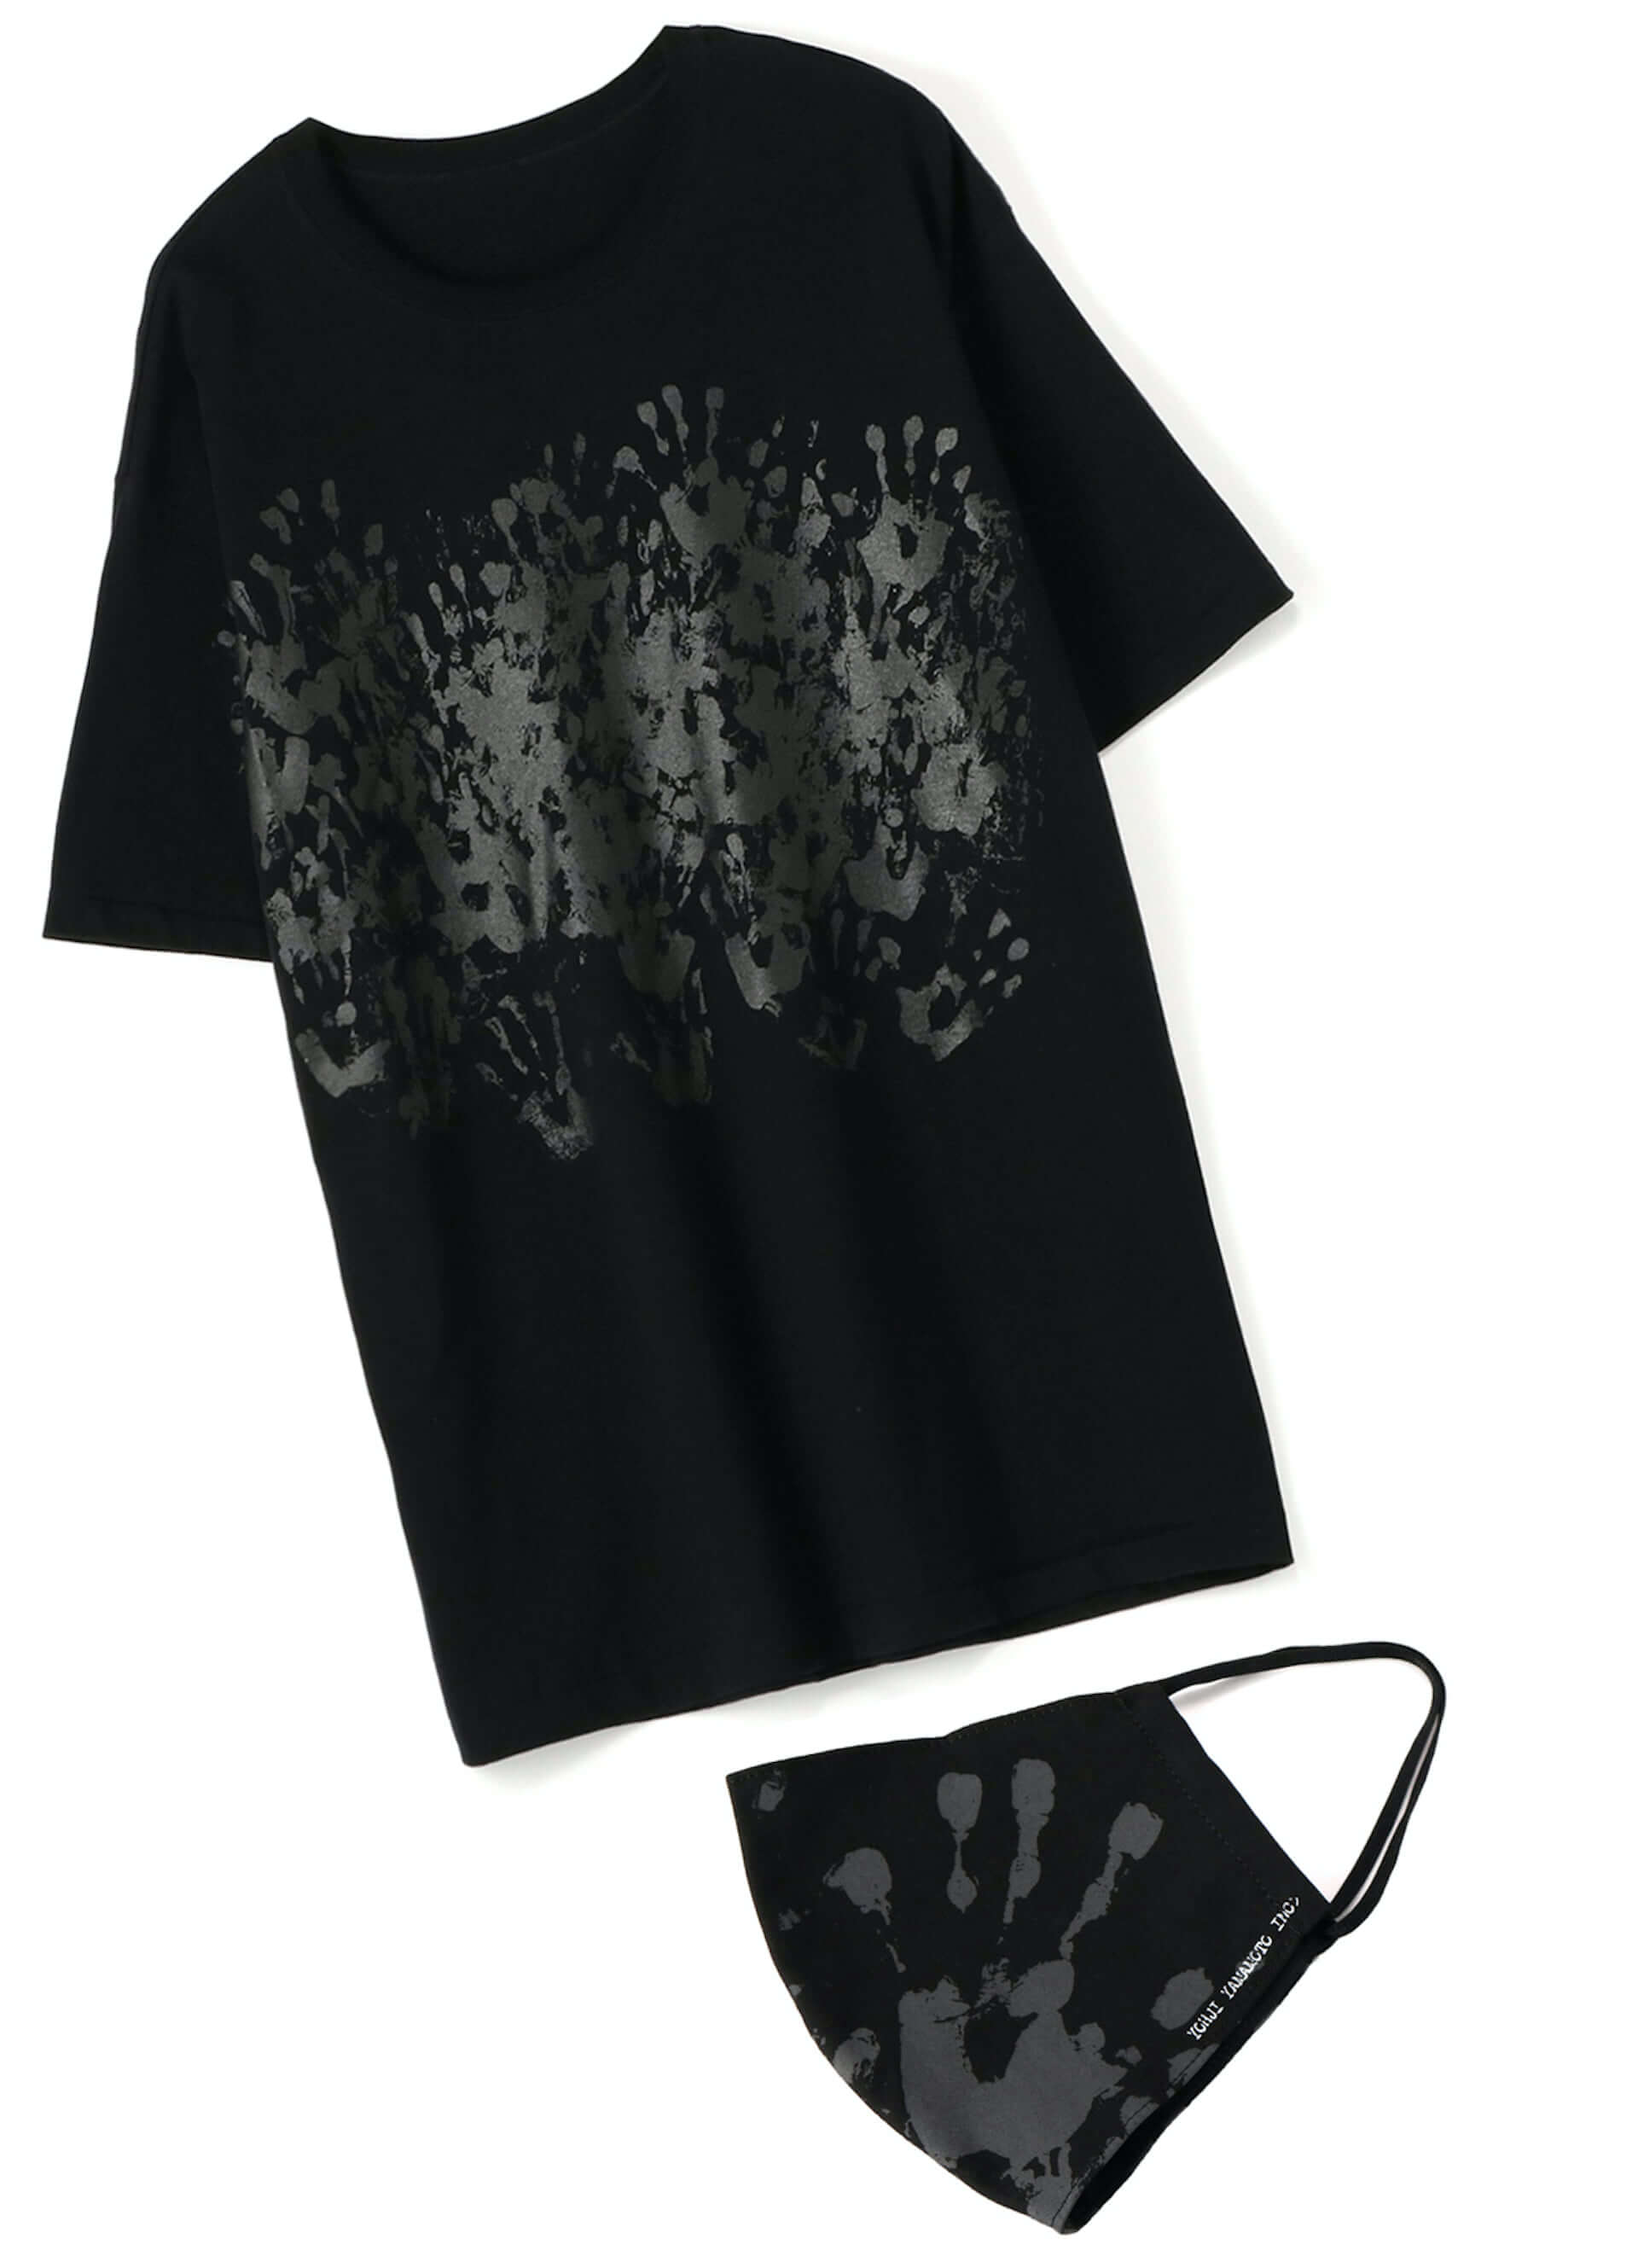 YOHJI YAMAMOTO +NOIRと画家 内田すずめがコラボした「Tシャツ+マスク」が限定販売!鳩や手の平のモチーフ3型 lf200604_yohjiyamamoto_02-1920x2658